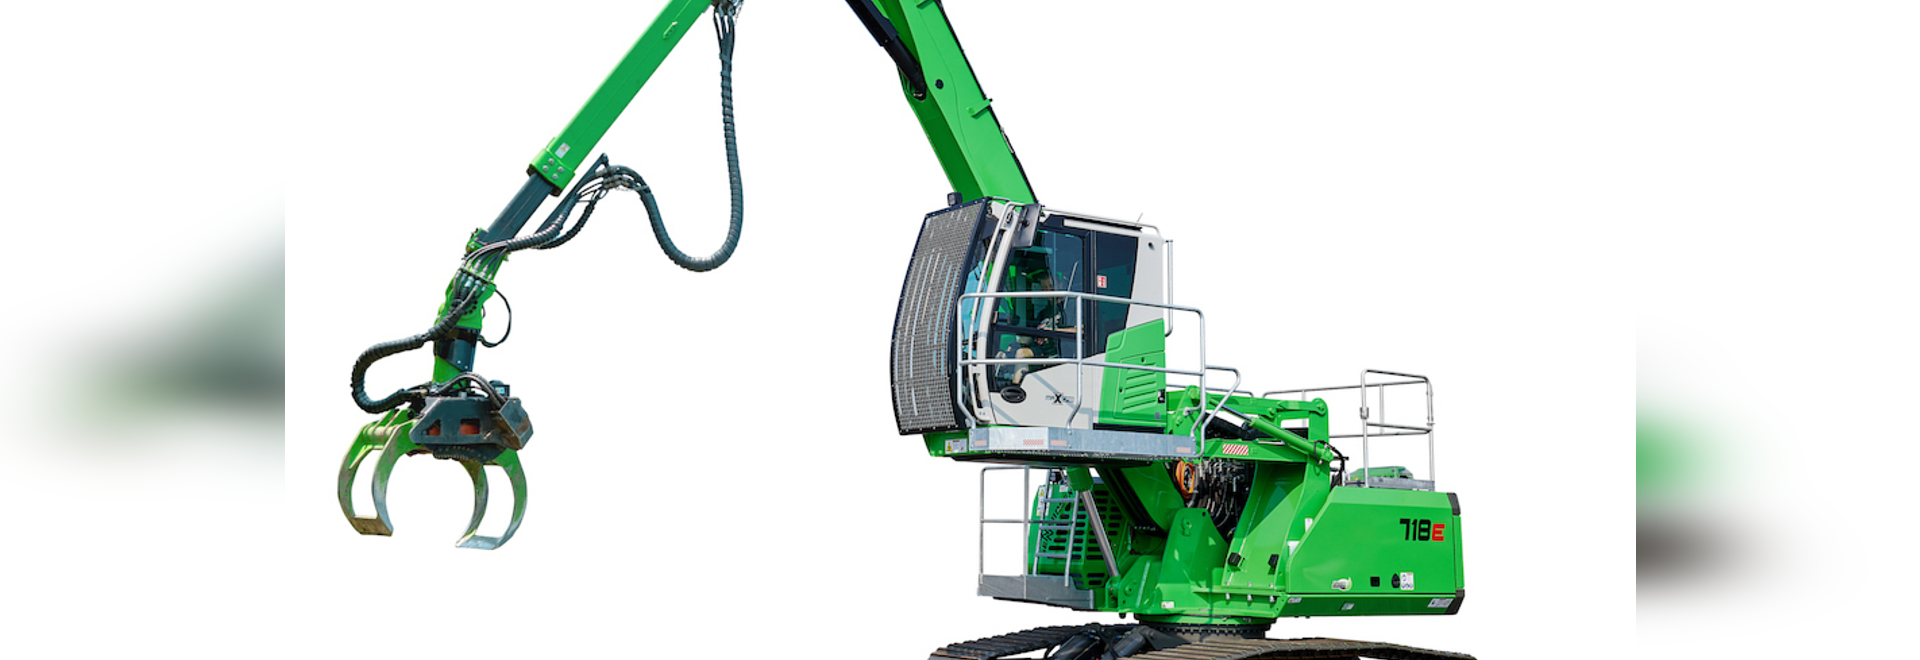 Sennebogen introduces off-road tree care machine